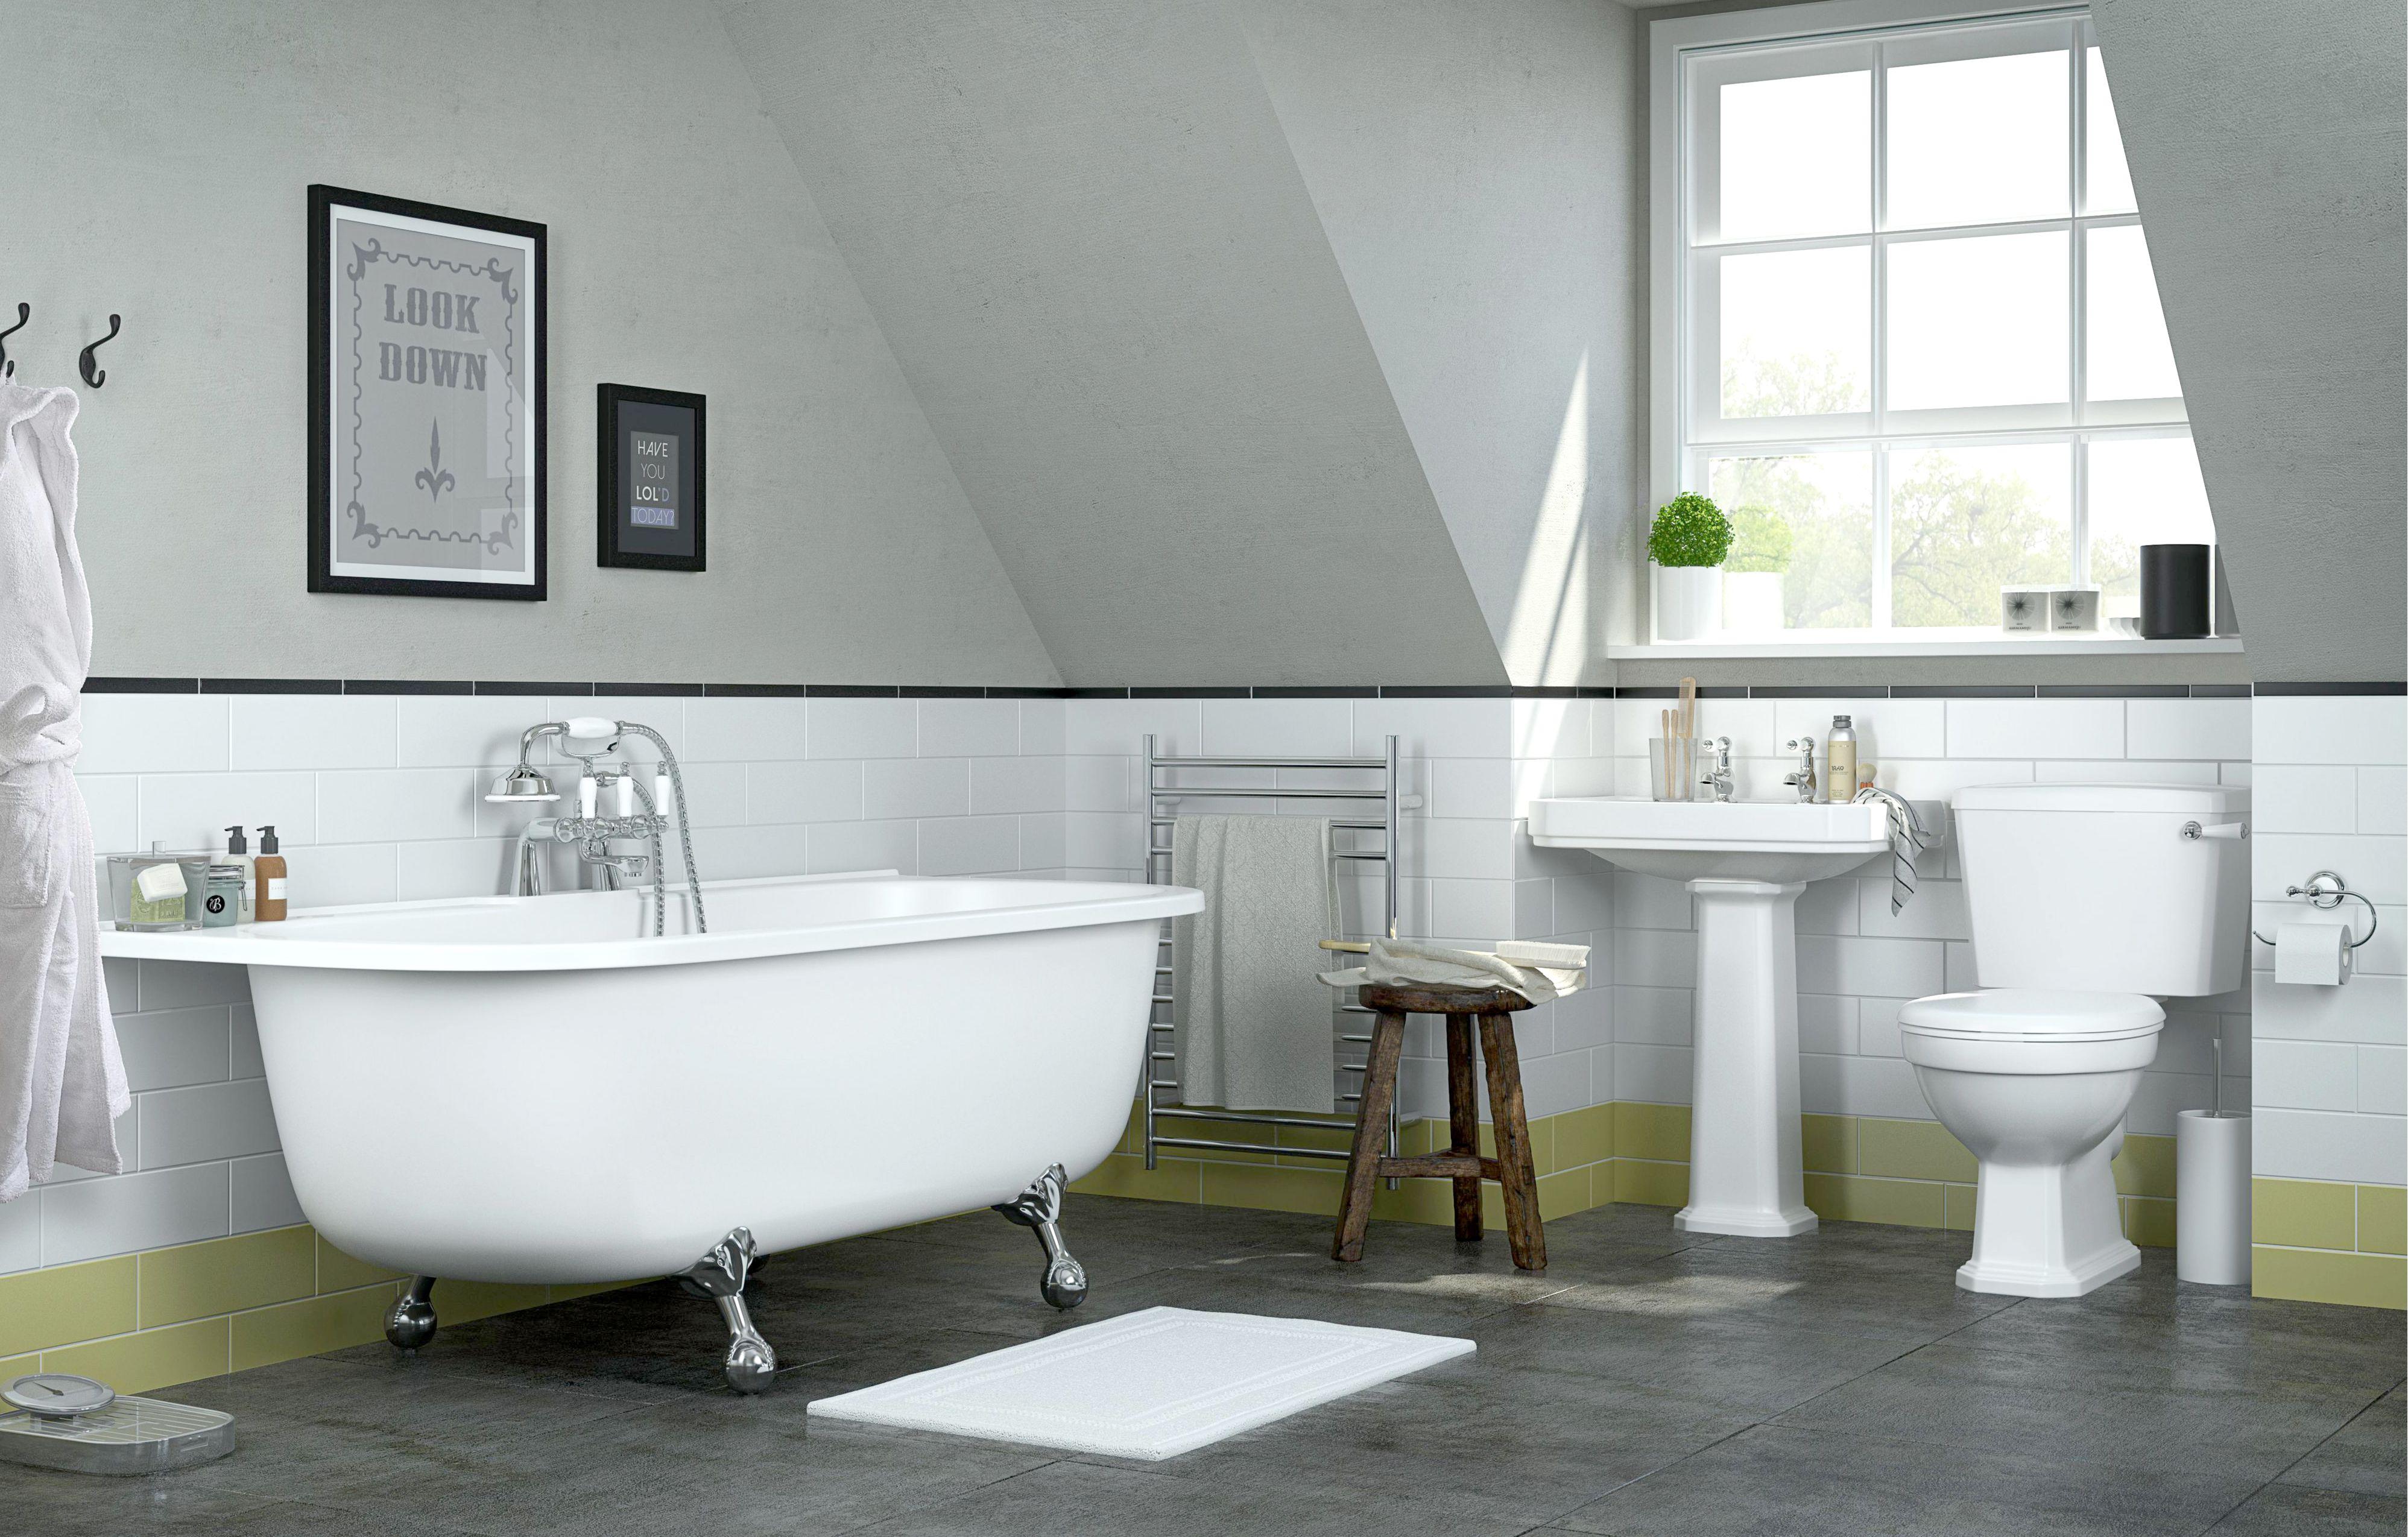 Serina Cooke Amp Lewis Bathroom Suites